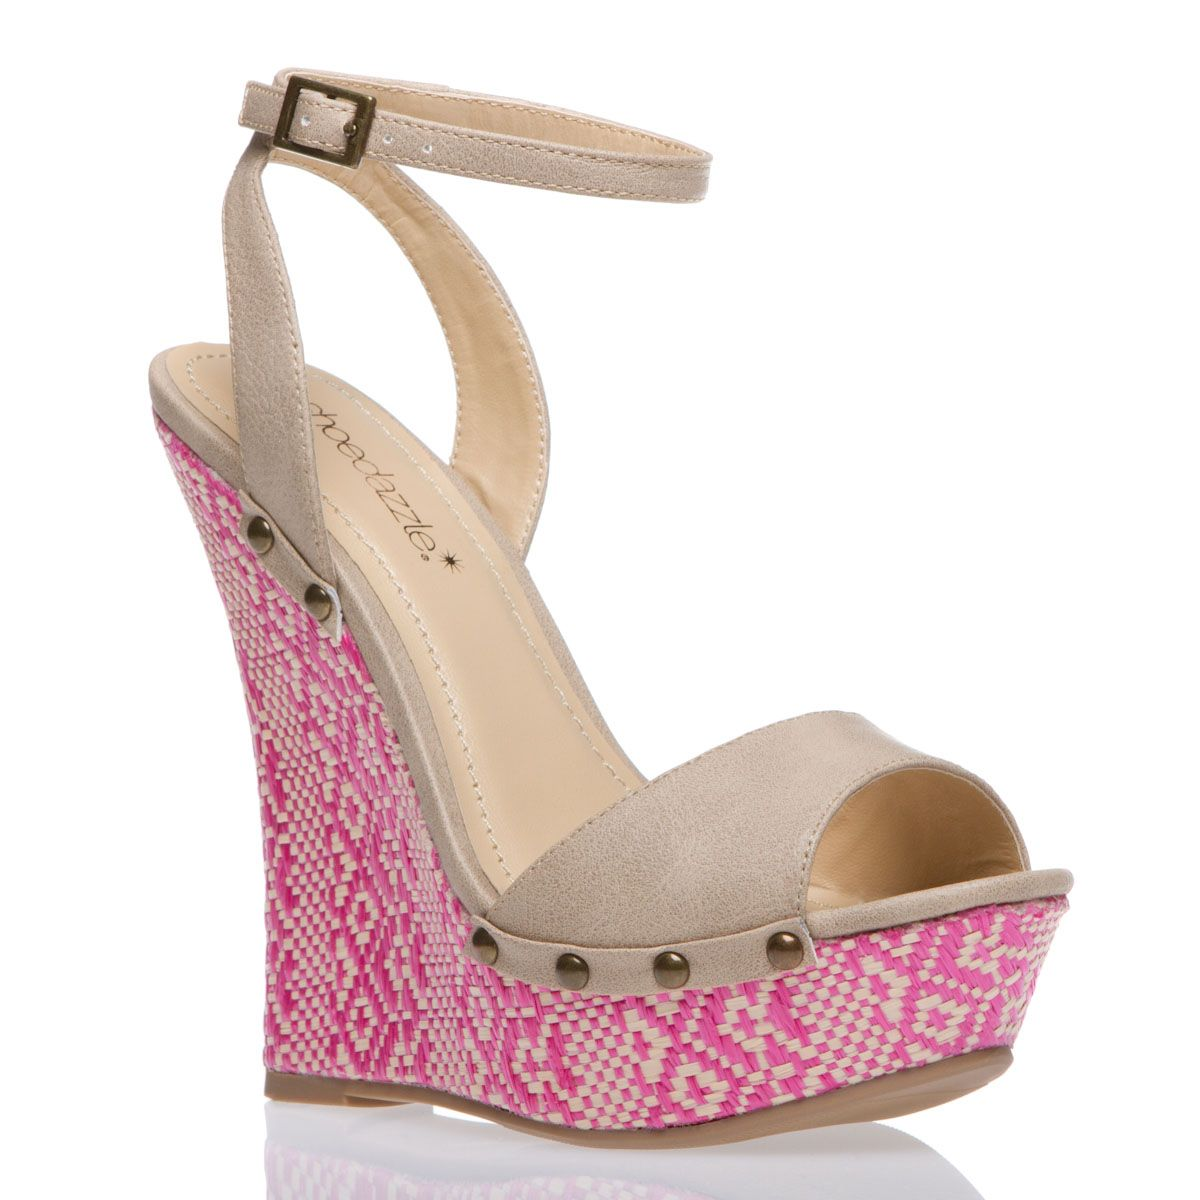 Malisa Wedge. Buy One, Get One at Shoedazzle. $39.95